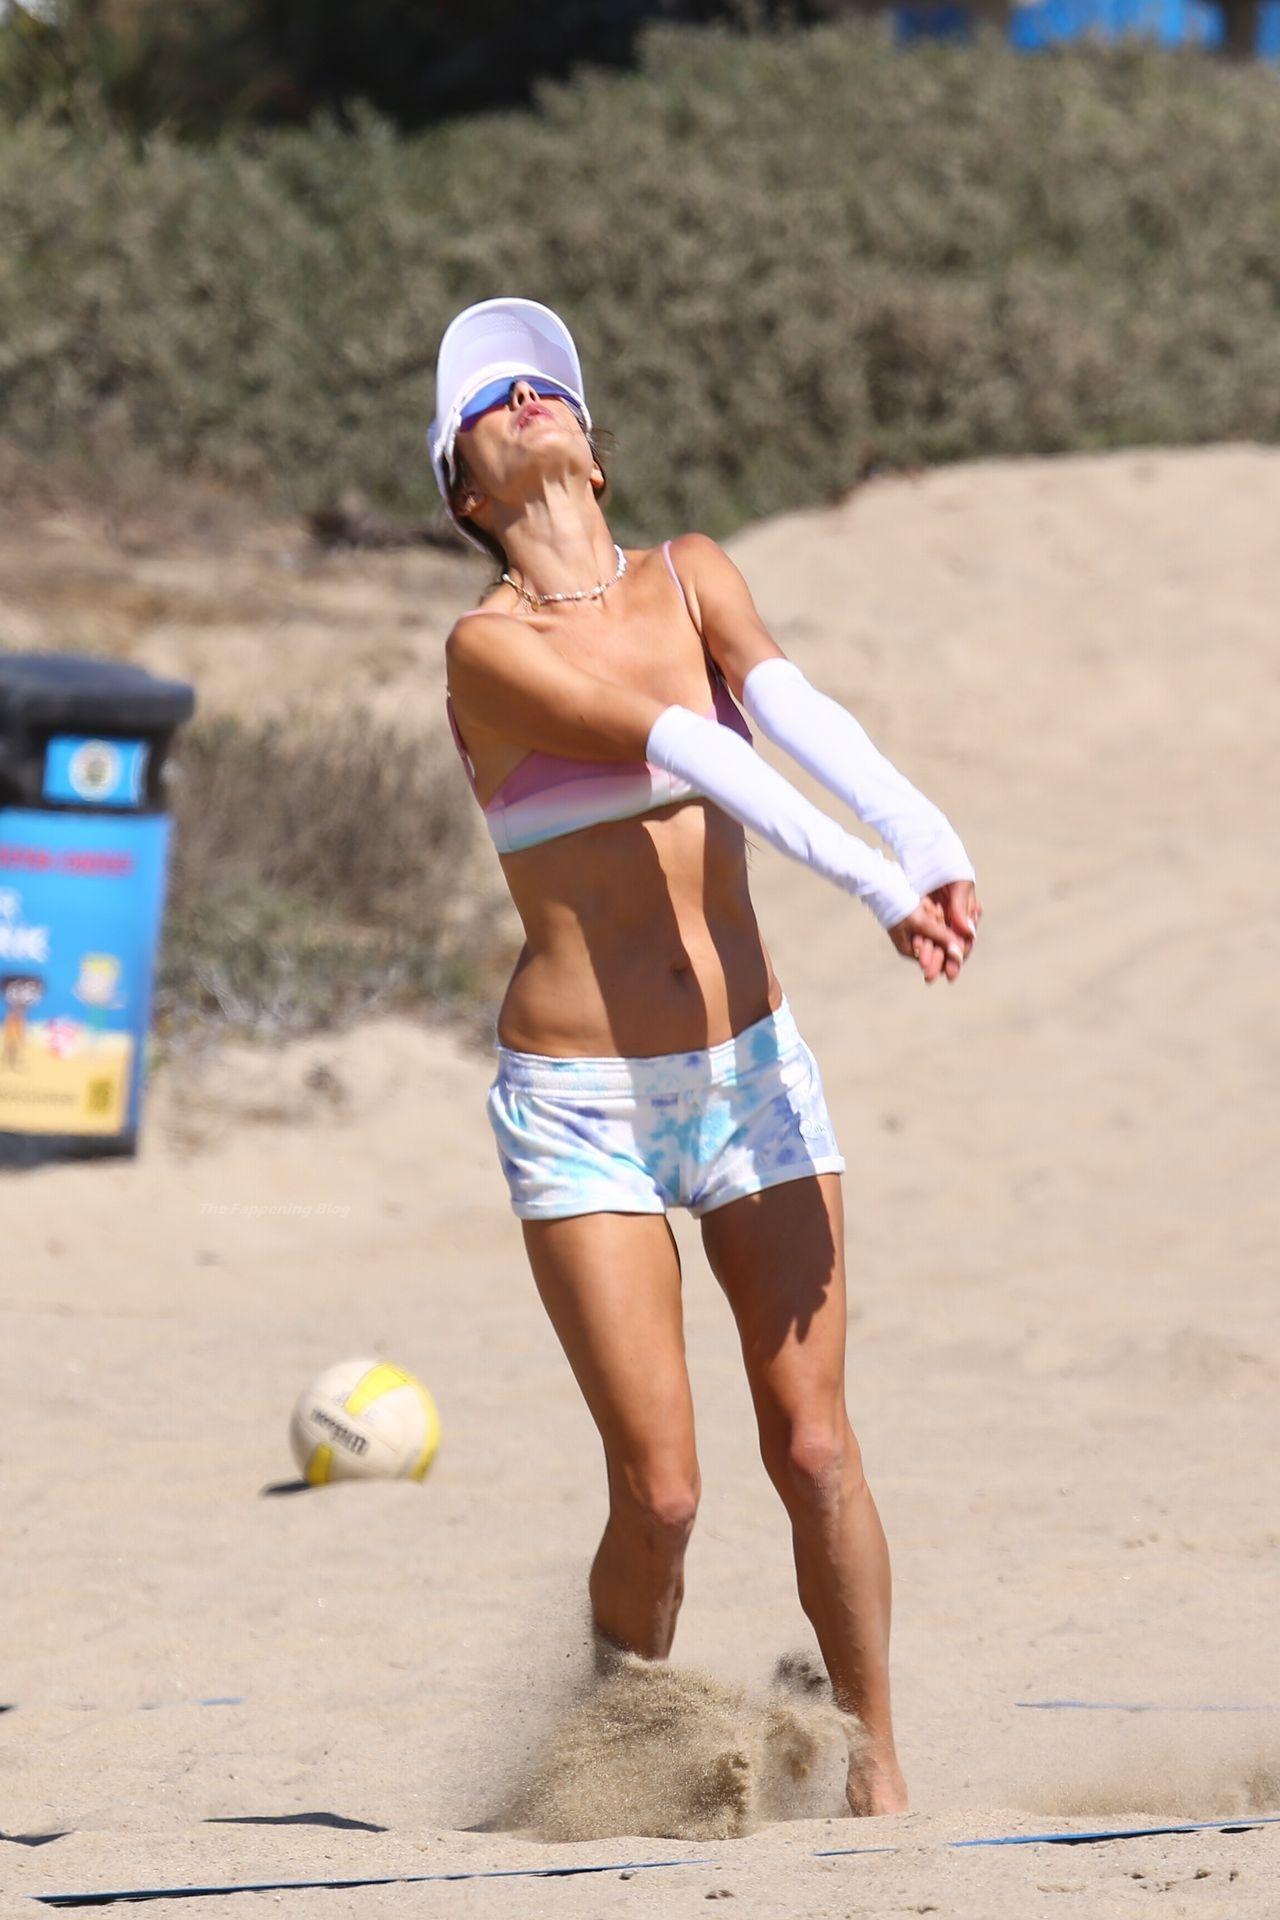 Alessandra-Ambrosio-Sexy-The-Fappening-Blog-6-2.jpg